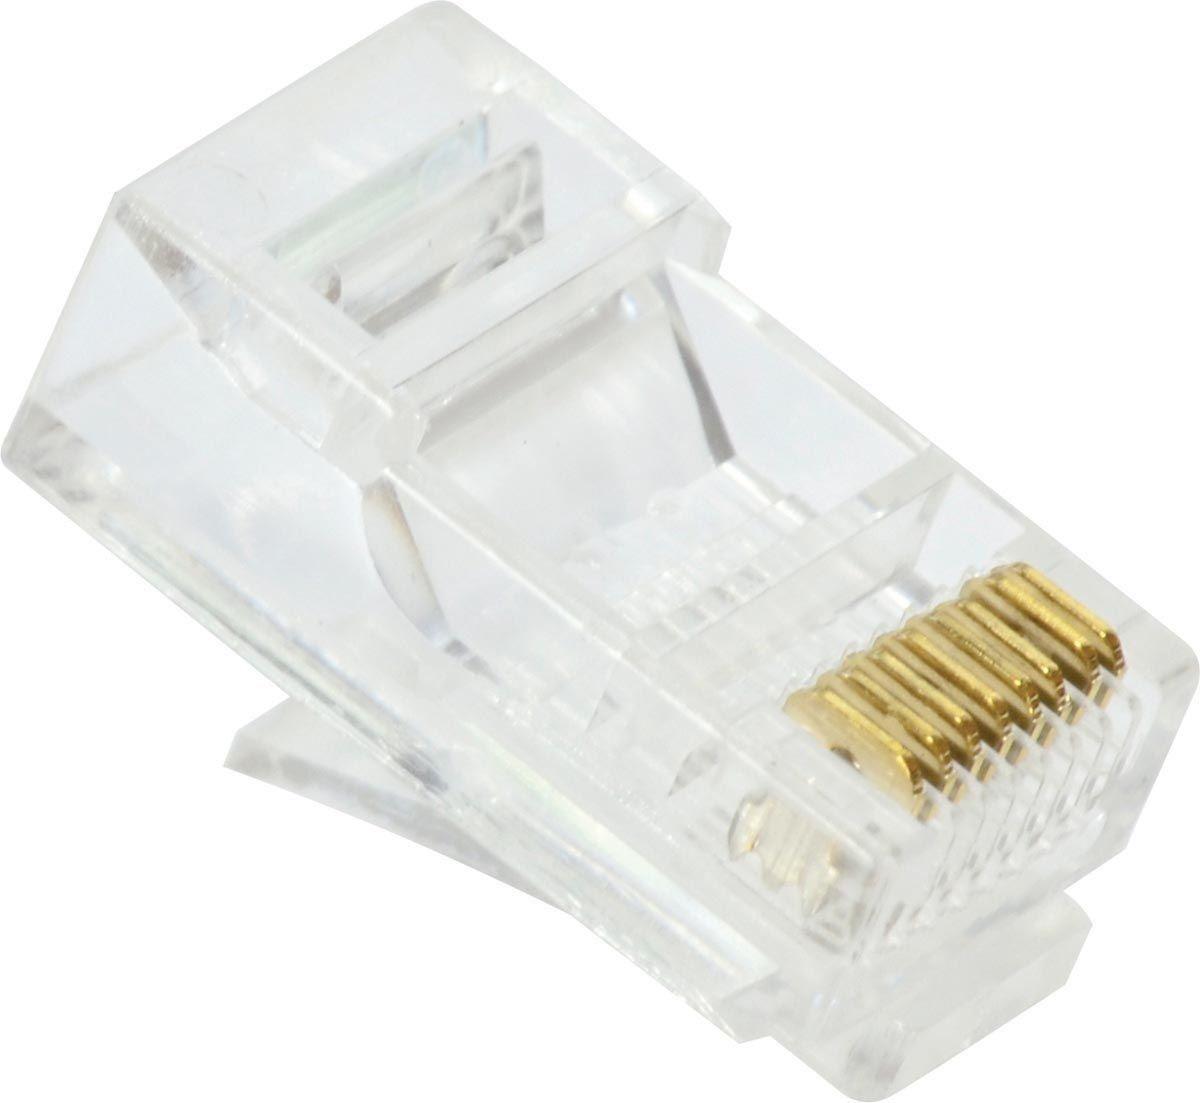 Conector RJ-45 8X8 CAT5E (UNIDADE) 23652 - Vinik